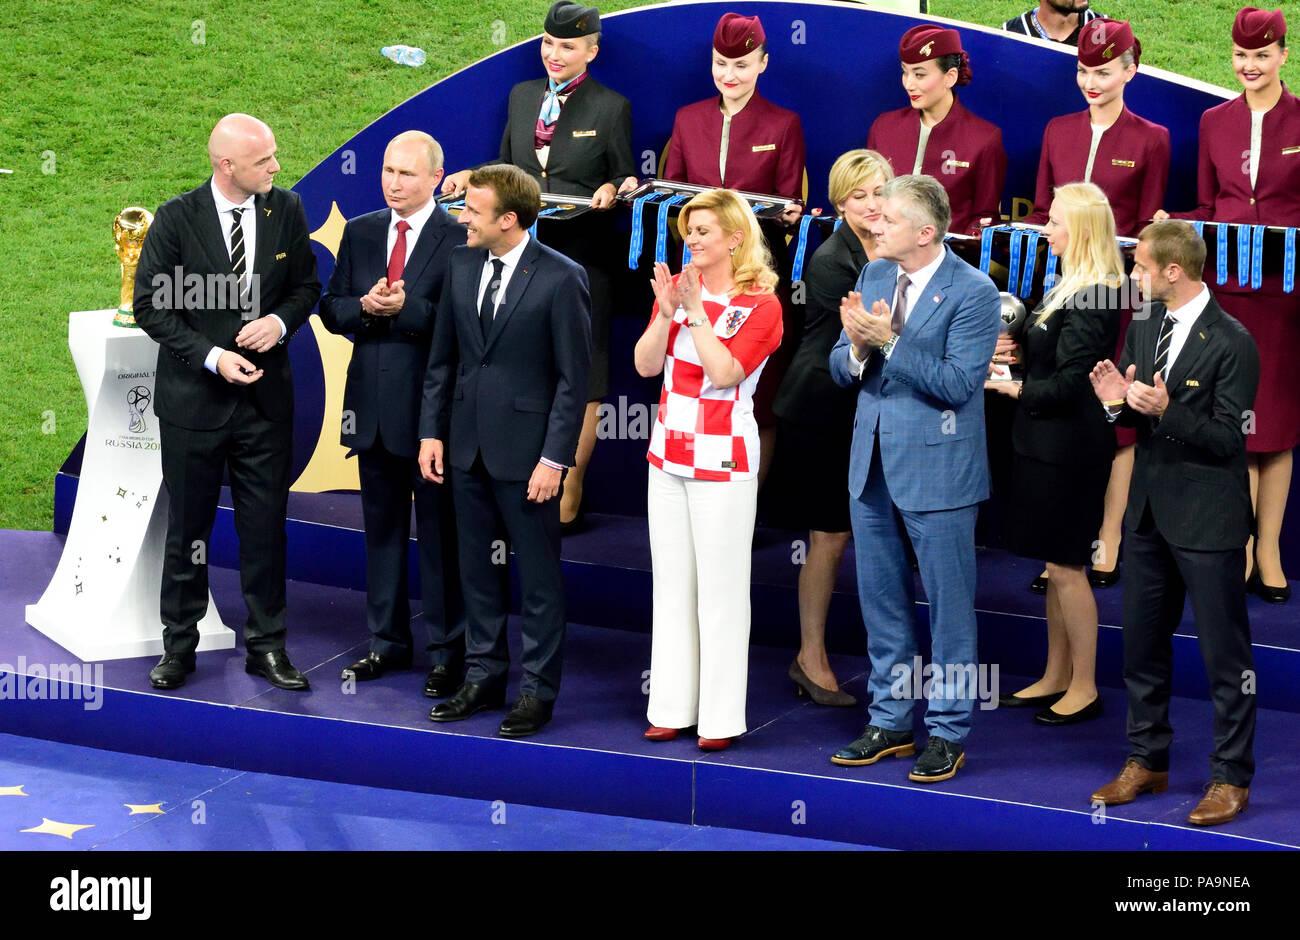 Moscow, Russia - July 15, 2018. Russian President Vladimir Putin, FIFA president Gianni Infantino, French president Emmanuel Macron and Croatia presid - Stock Image